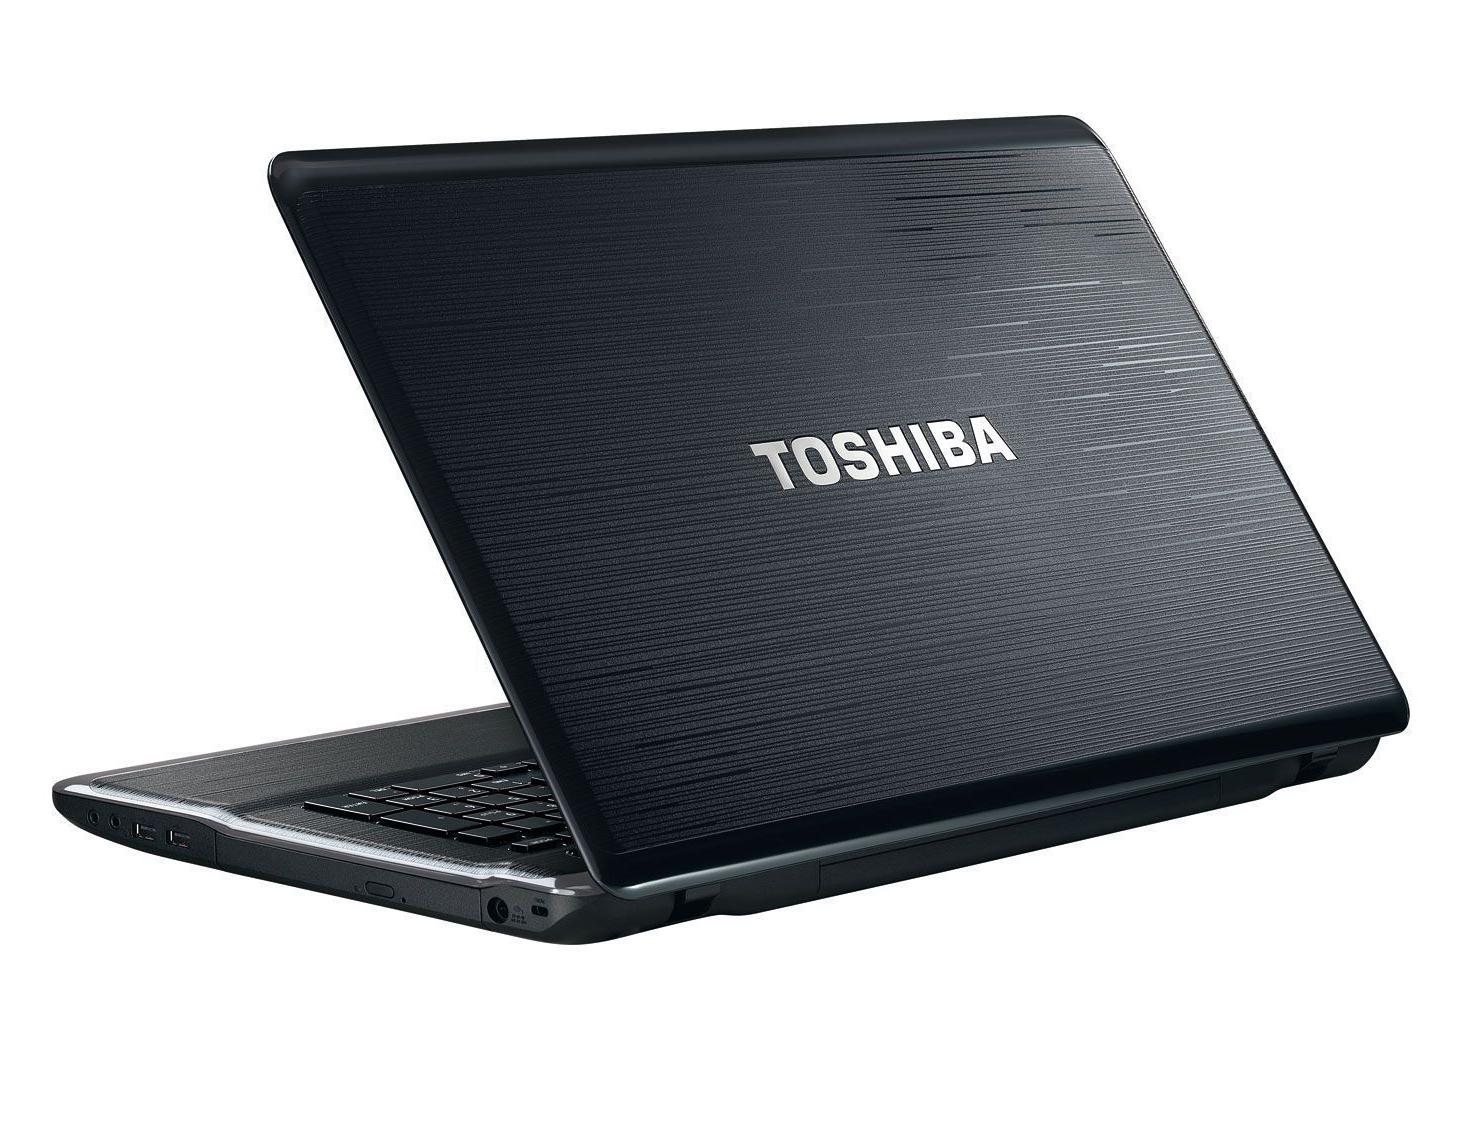 Toshiba Satellite P770 Drivers (2019)